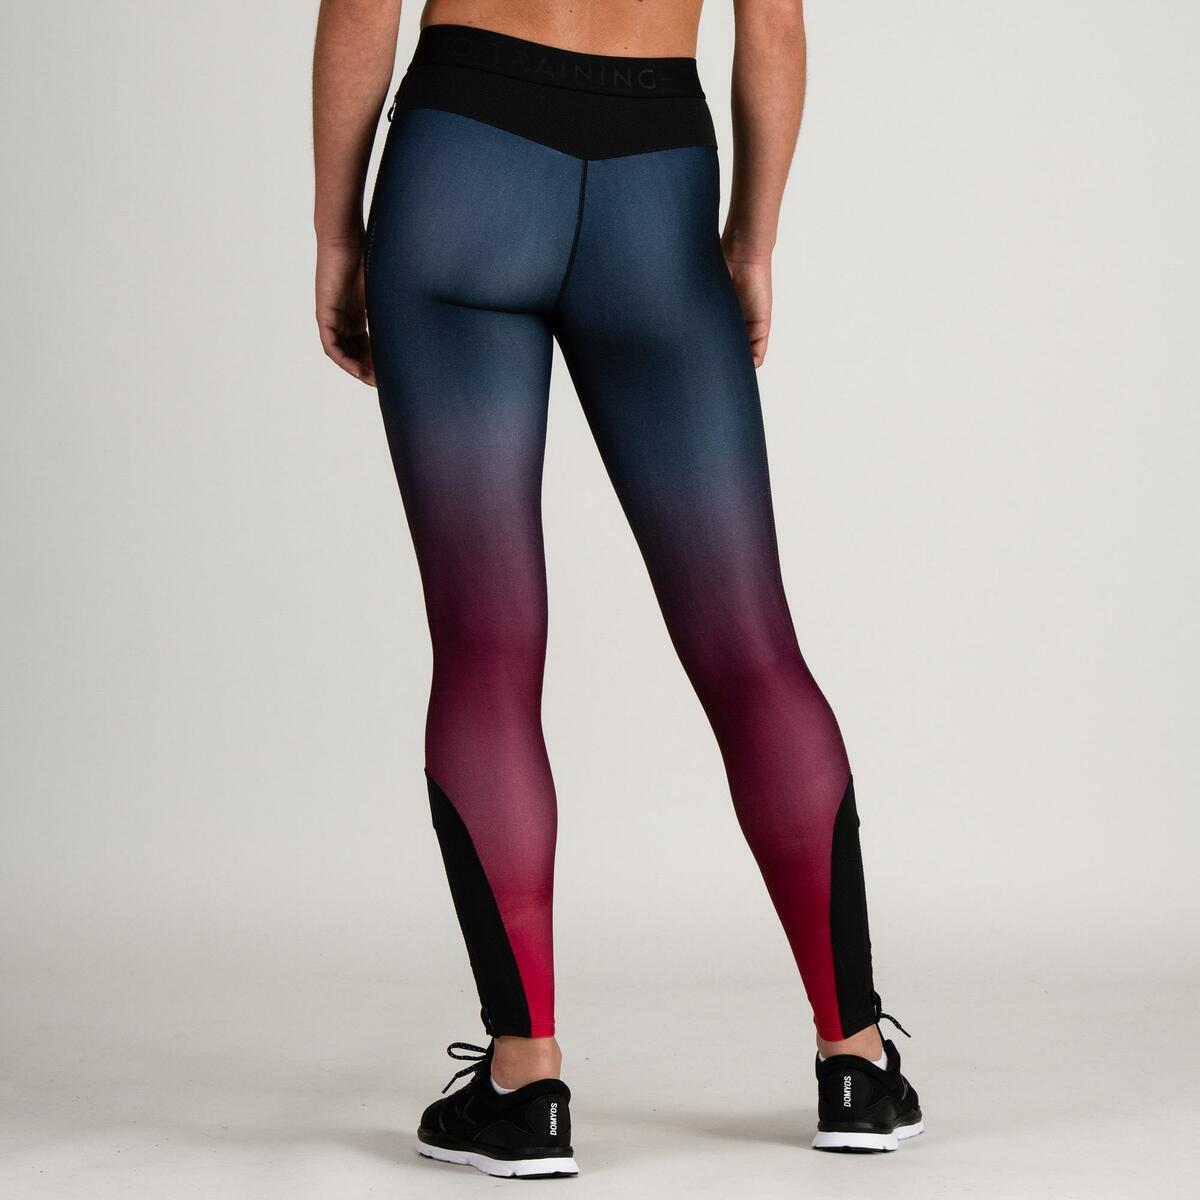 Bild 4 von Leggings FTI 500 Fitness Cardio Damen bordeaux